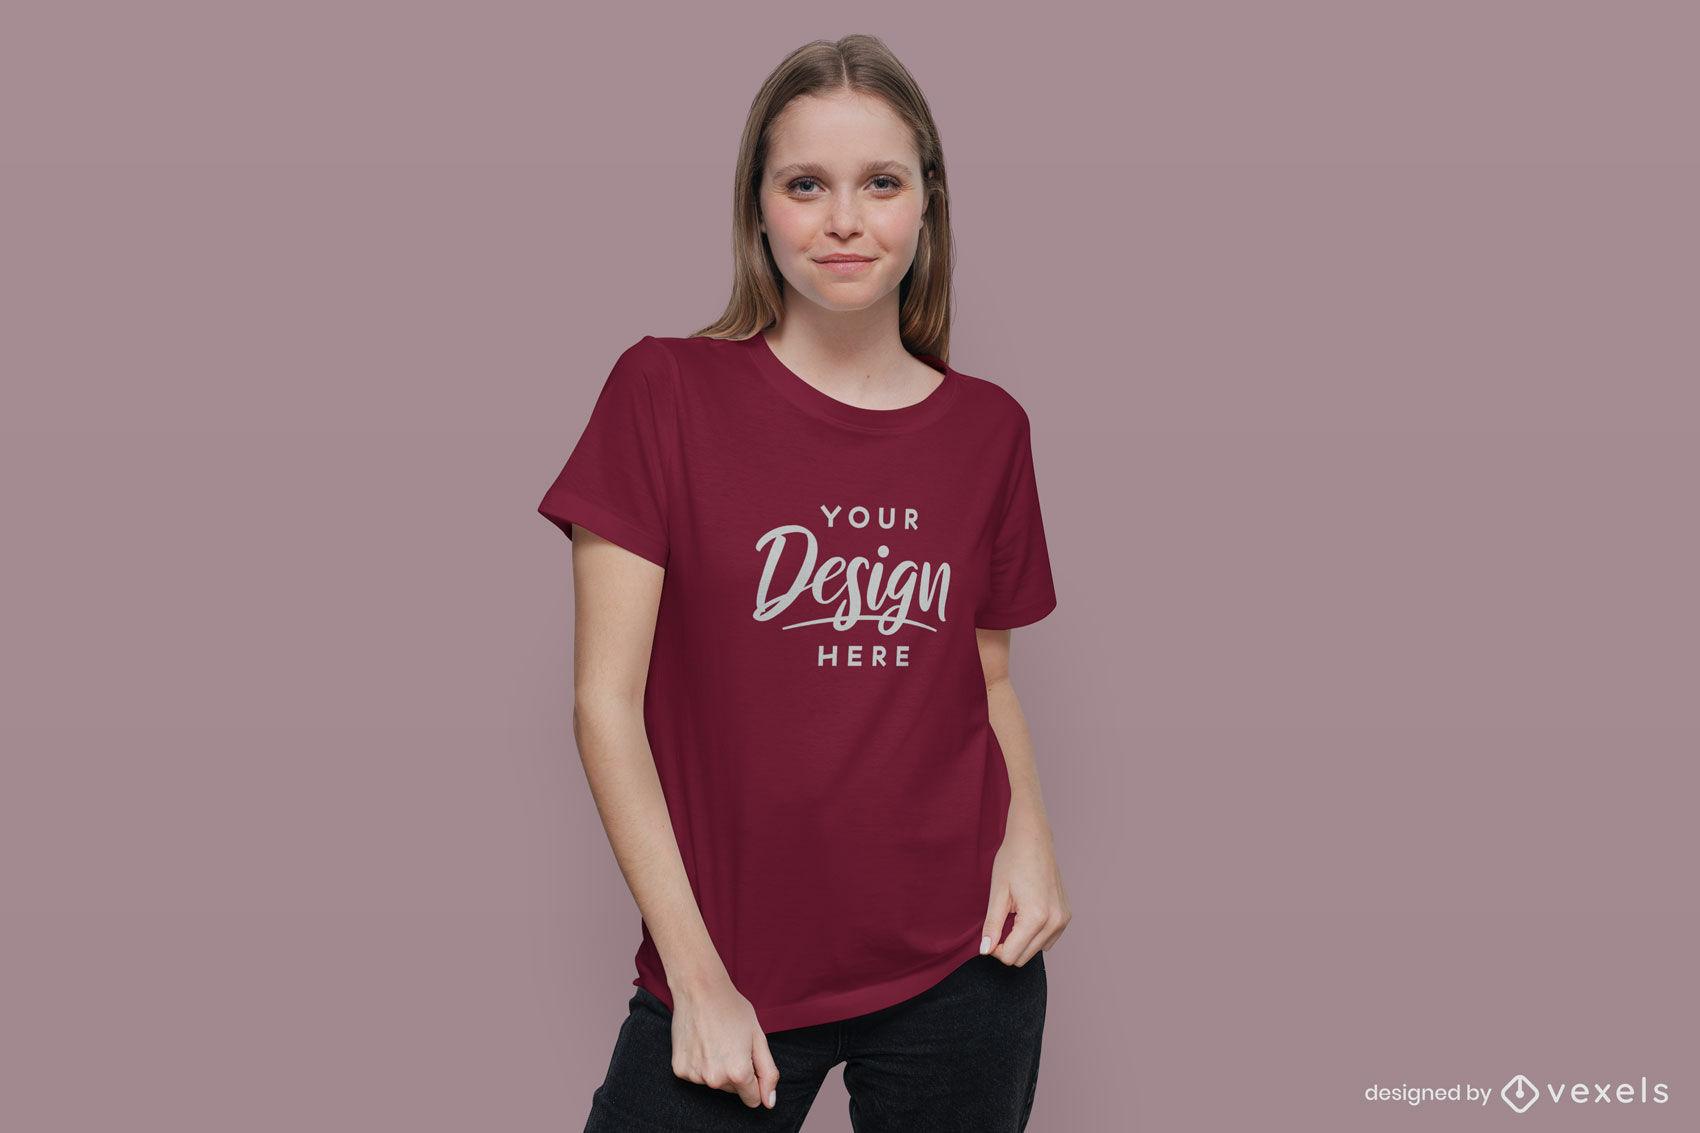 Red t-shirt girl mockup in dark background